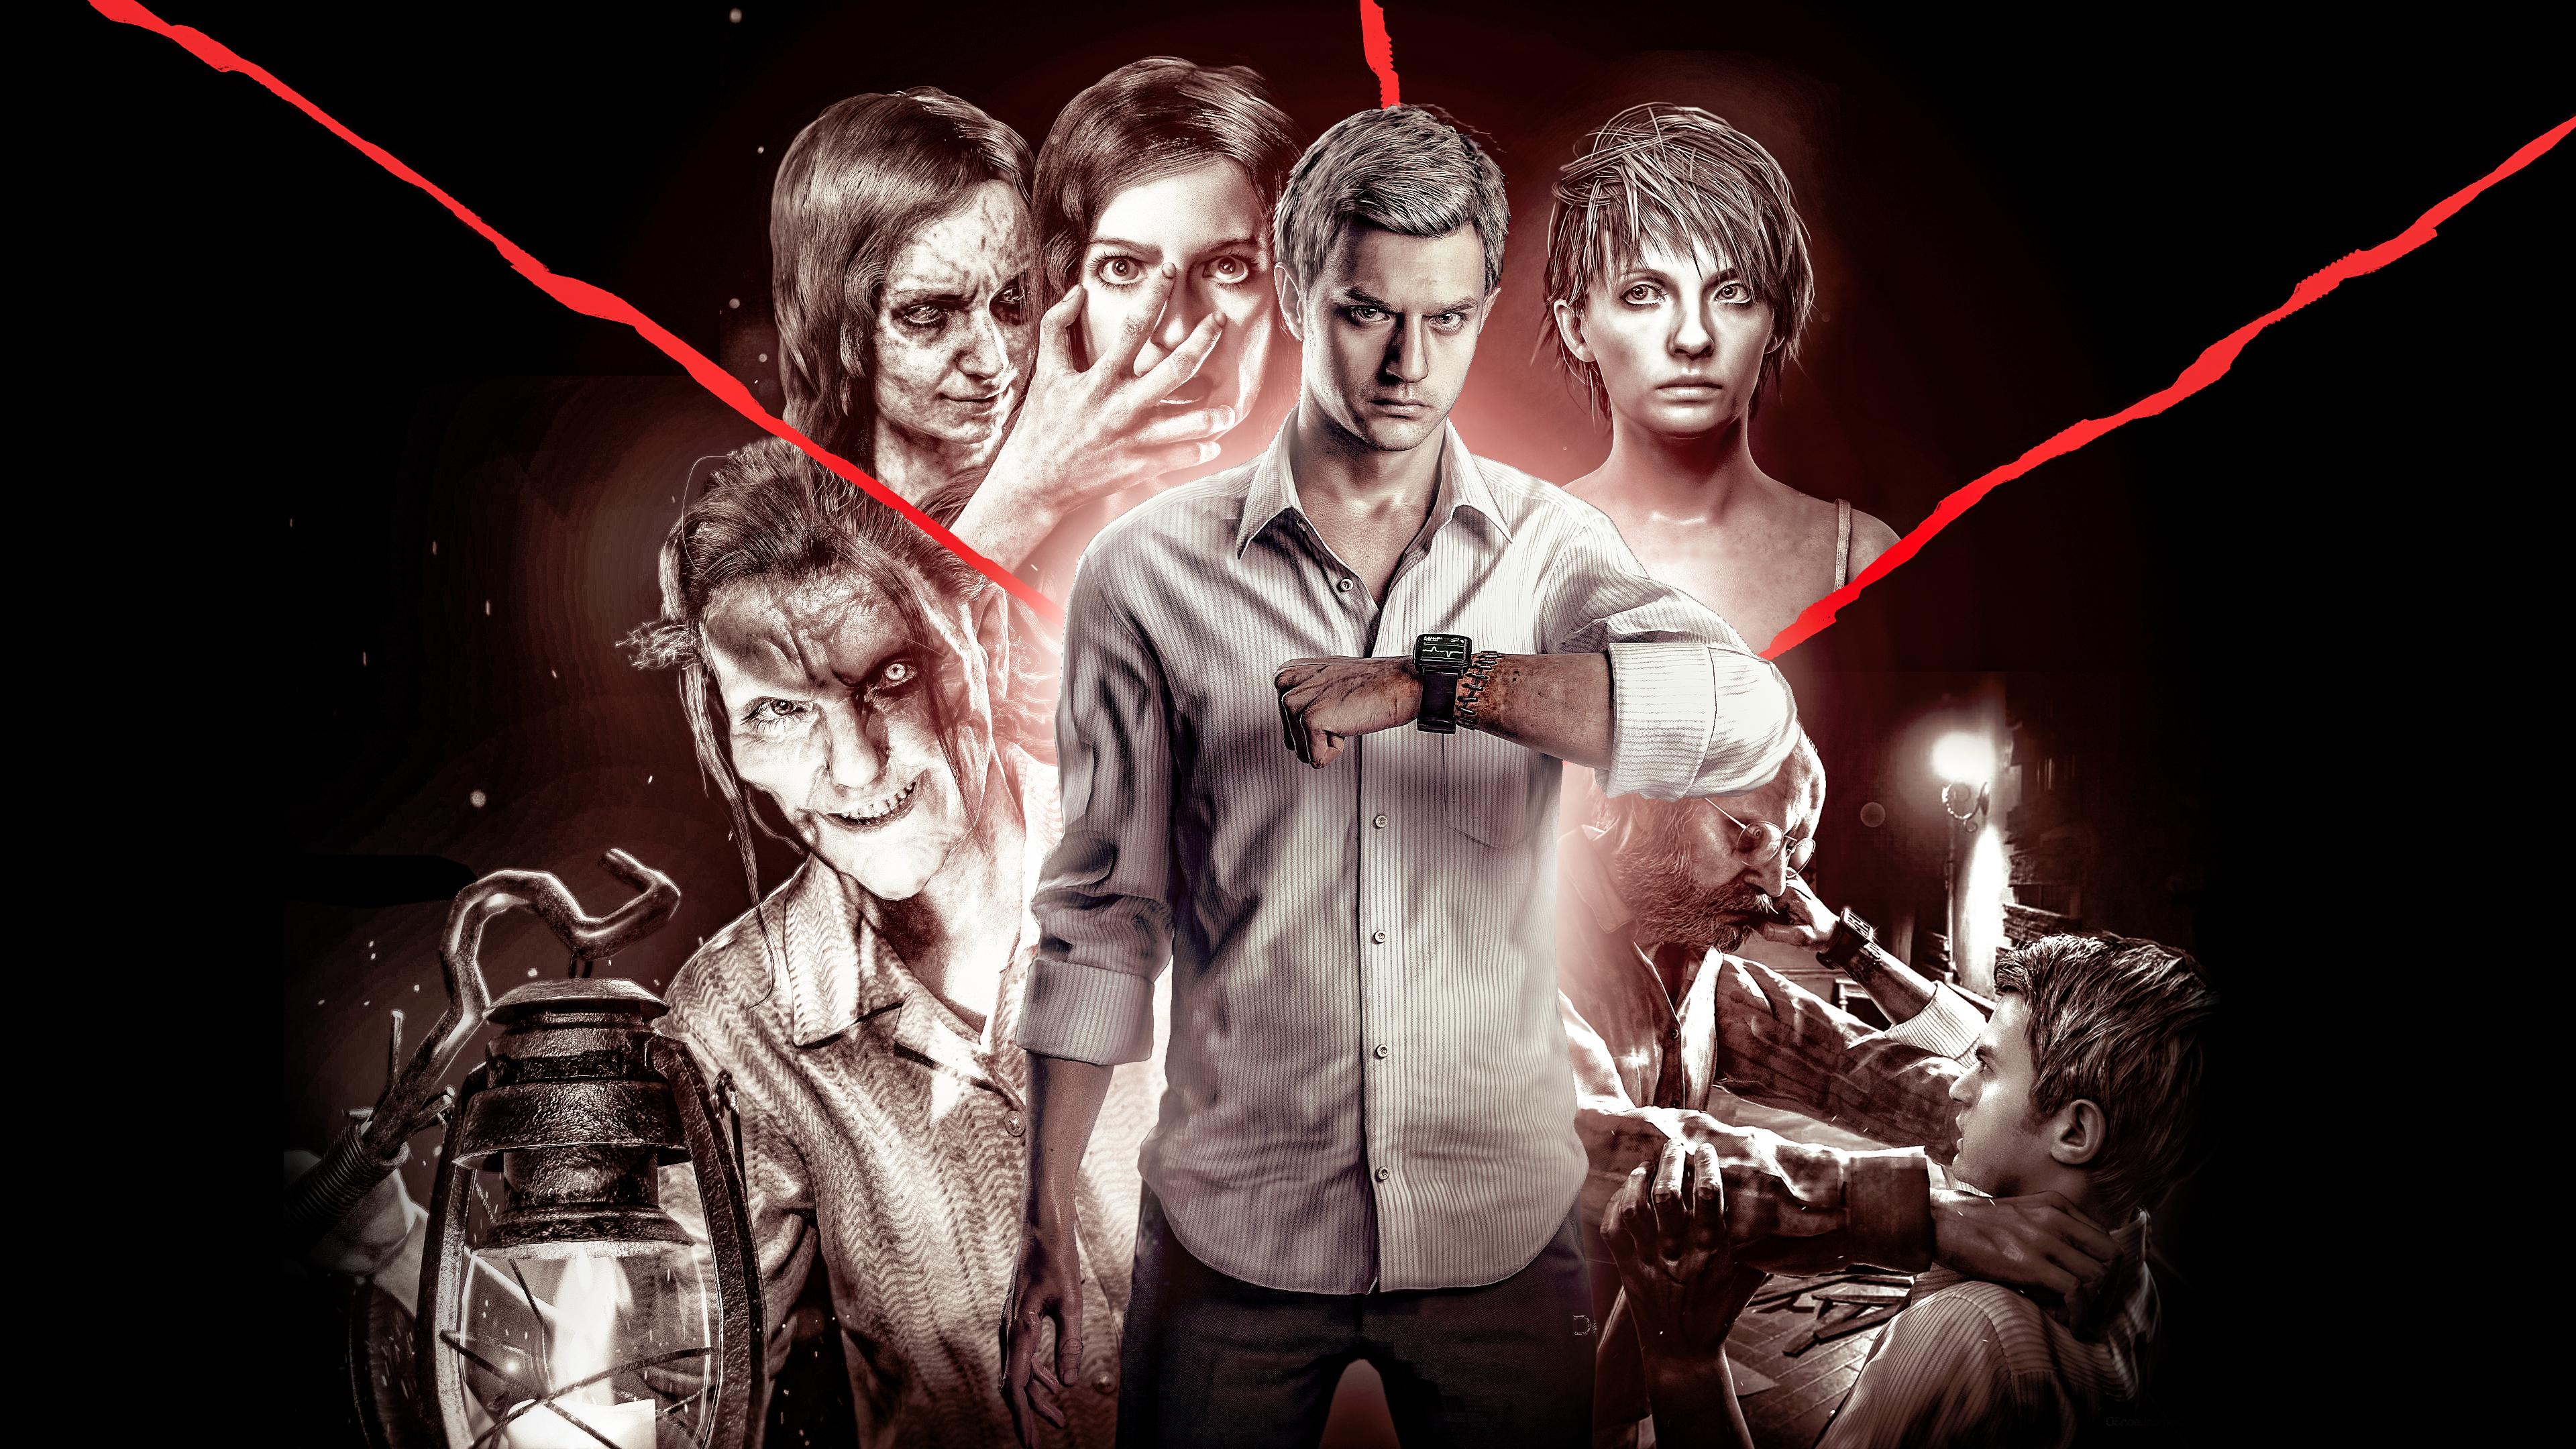 Resident Evil 7 Biohazard Wallpaper By Eversontomiello On